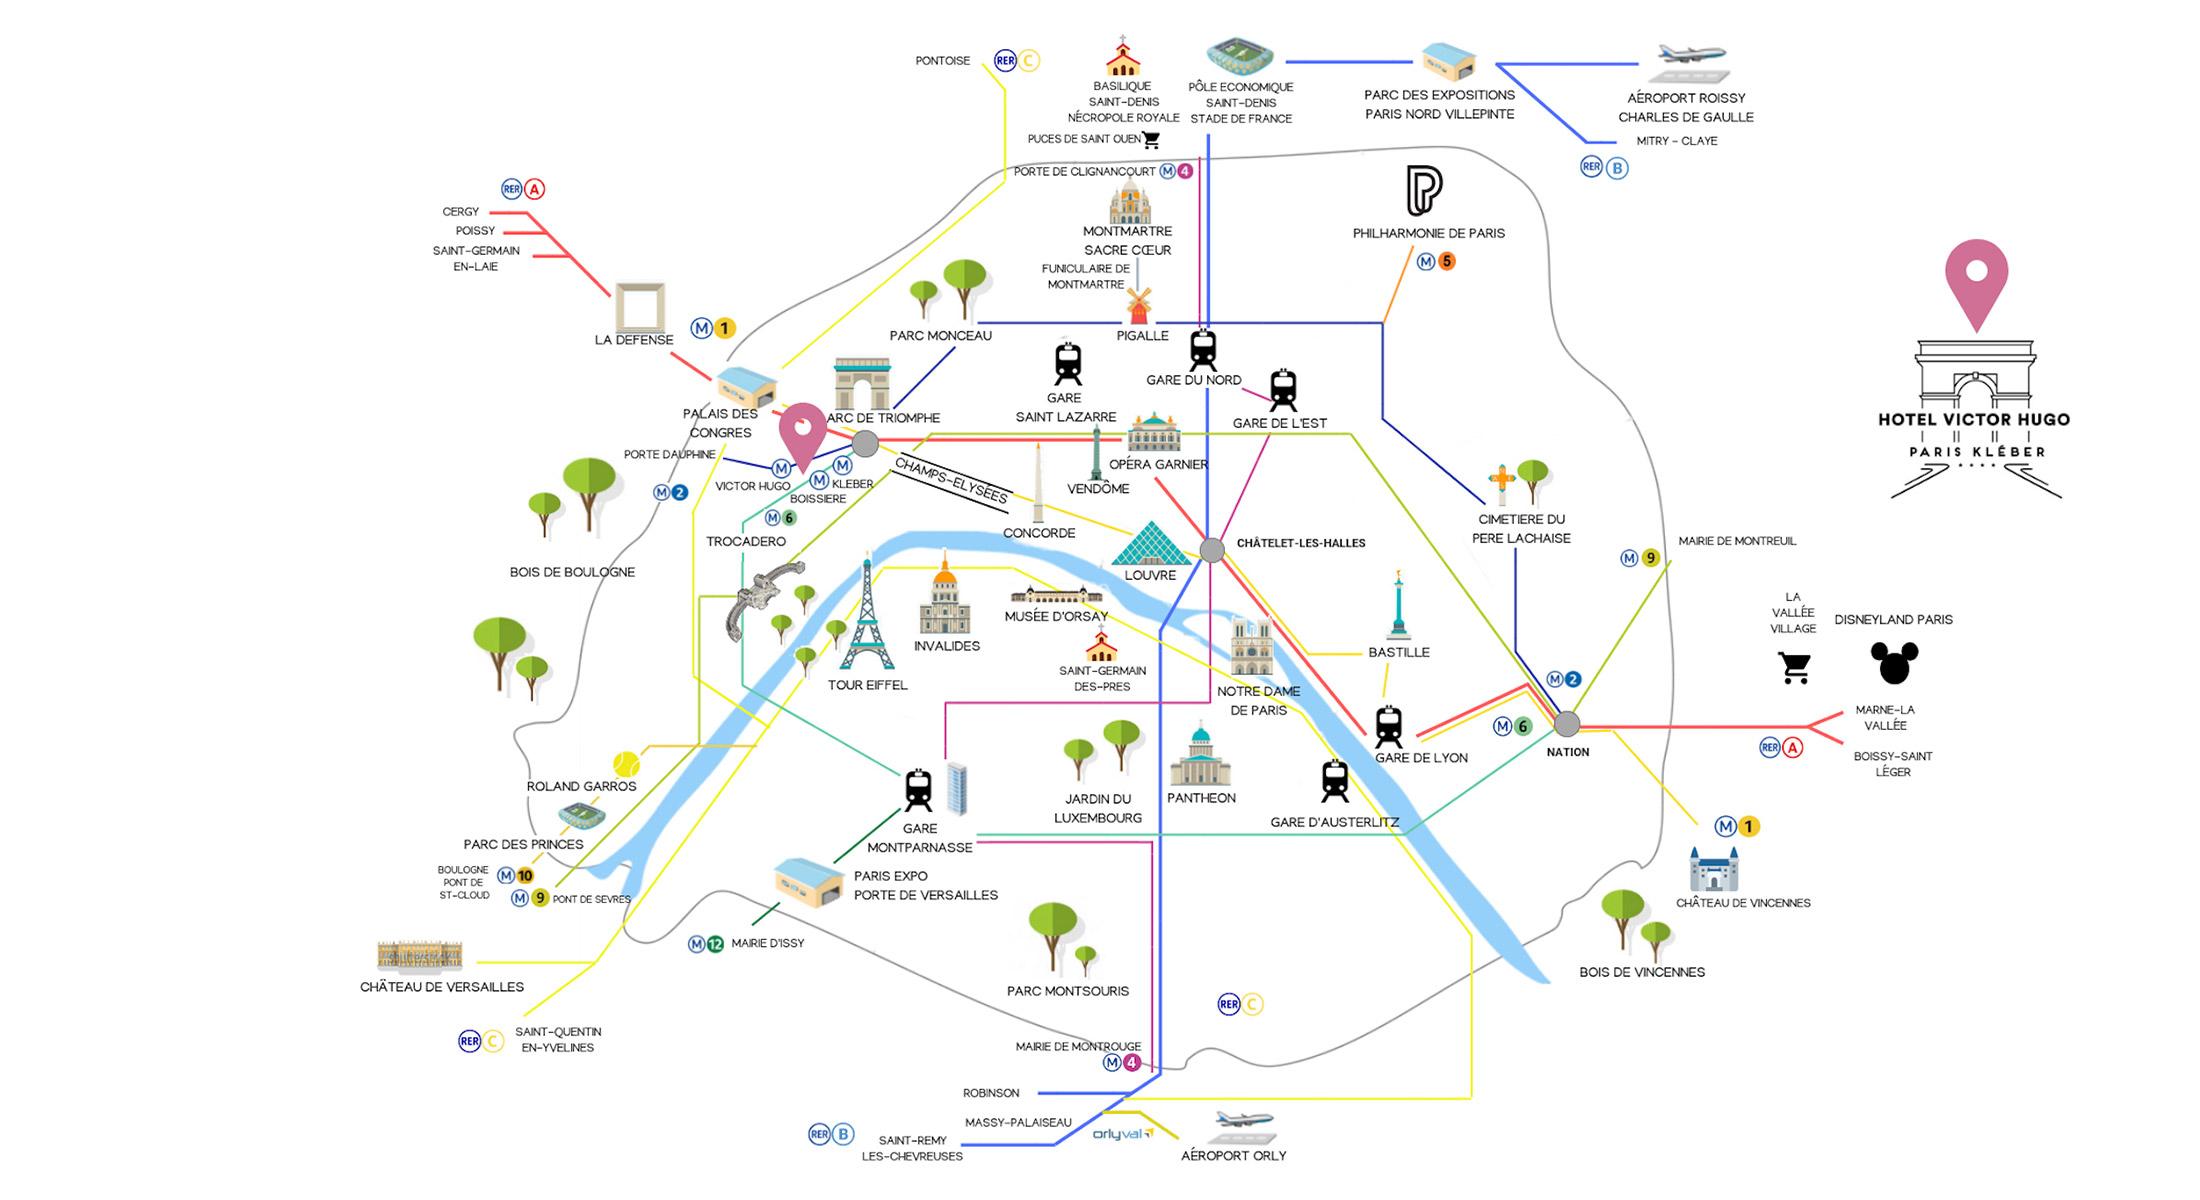 Cartina Politica Di Parigi.Hotel Victor Hugo Paris Kleber Hotel Raffinato Tour Eiffel Parigi Mappa